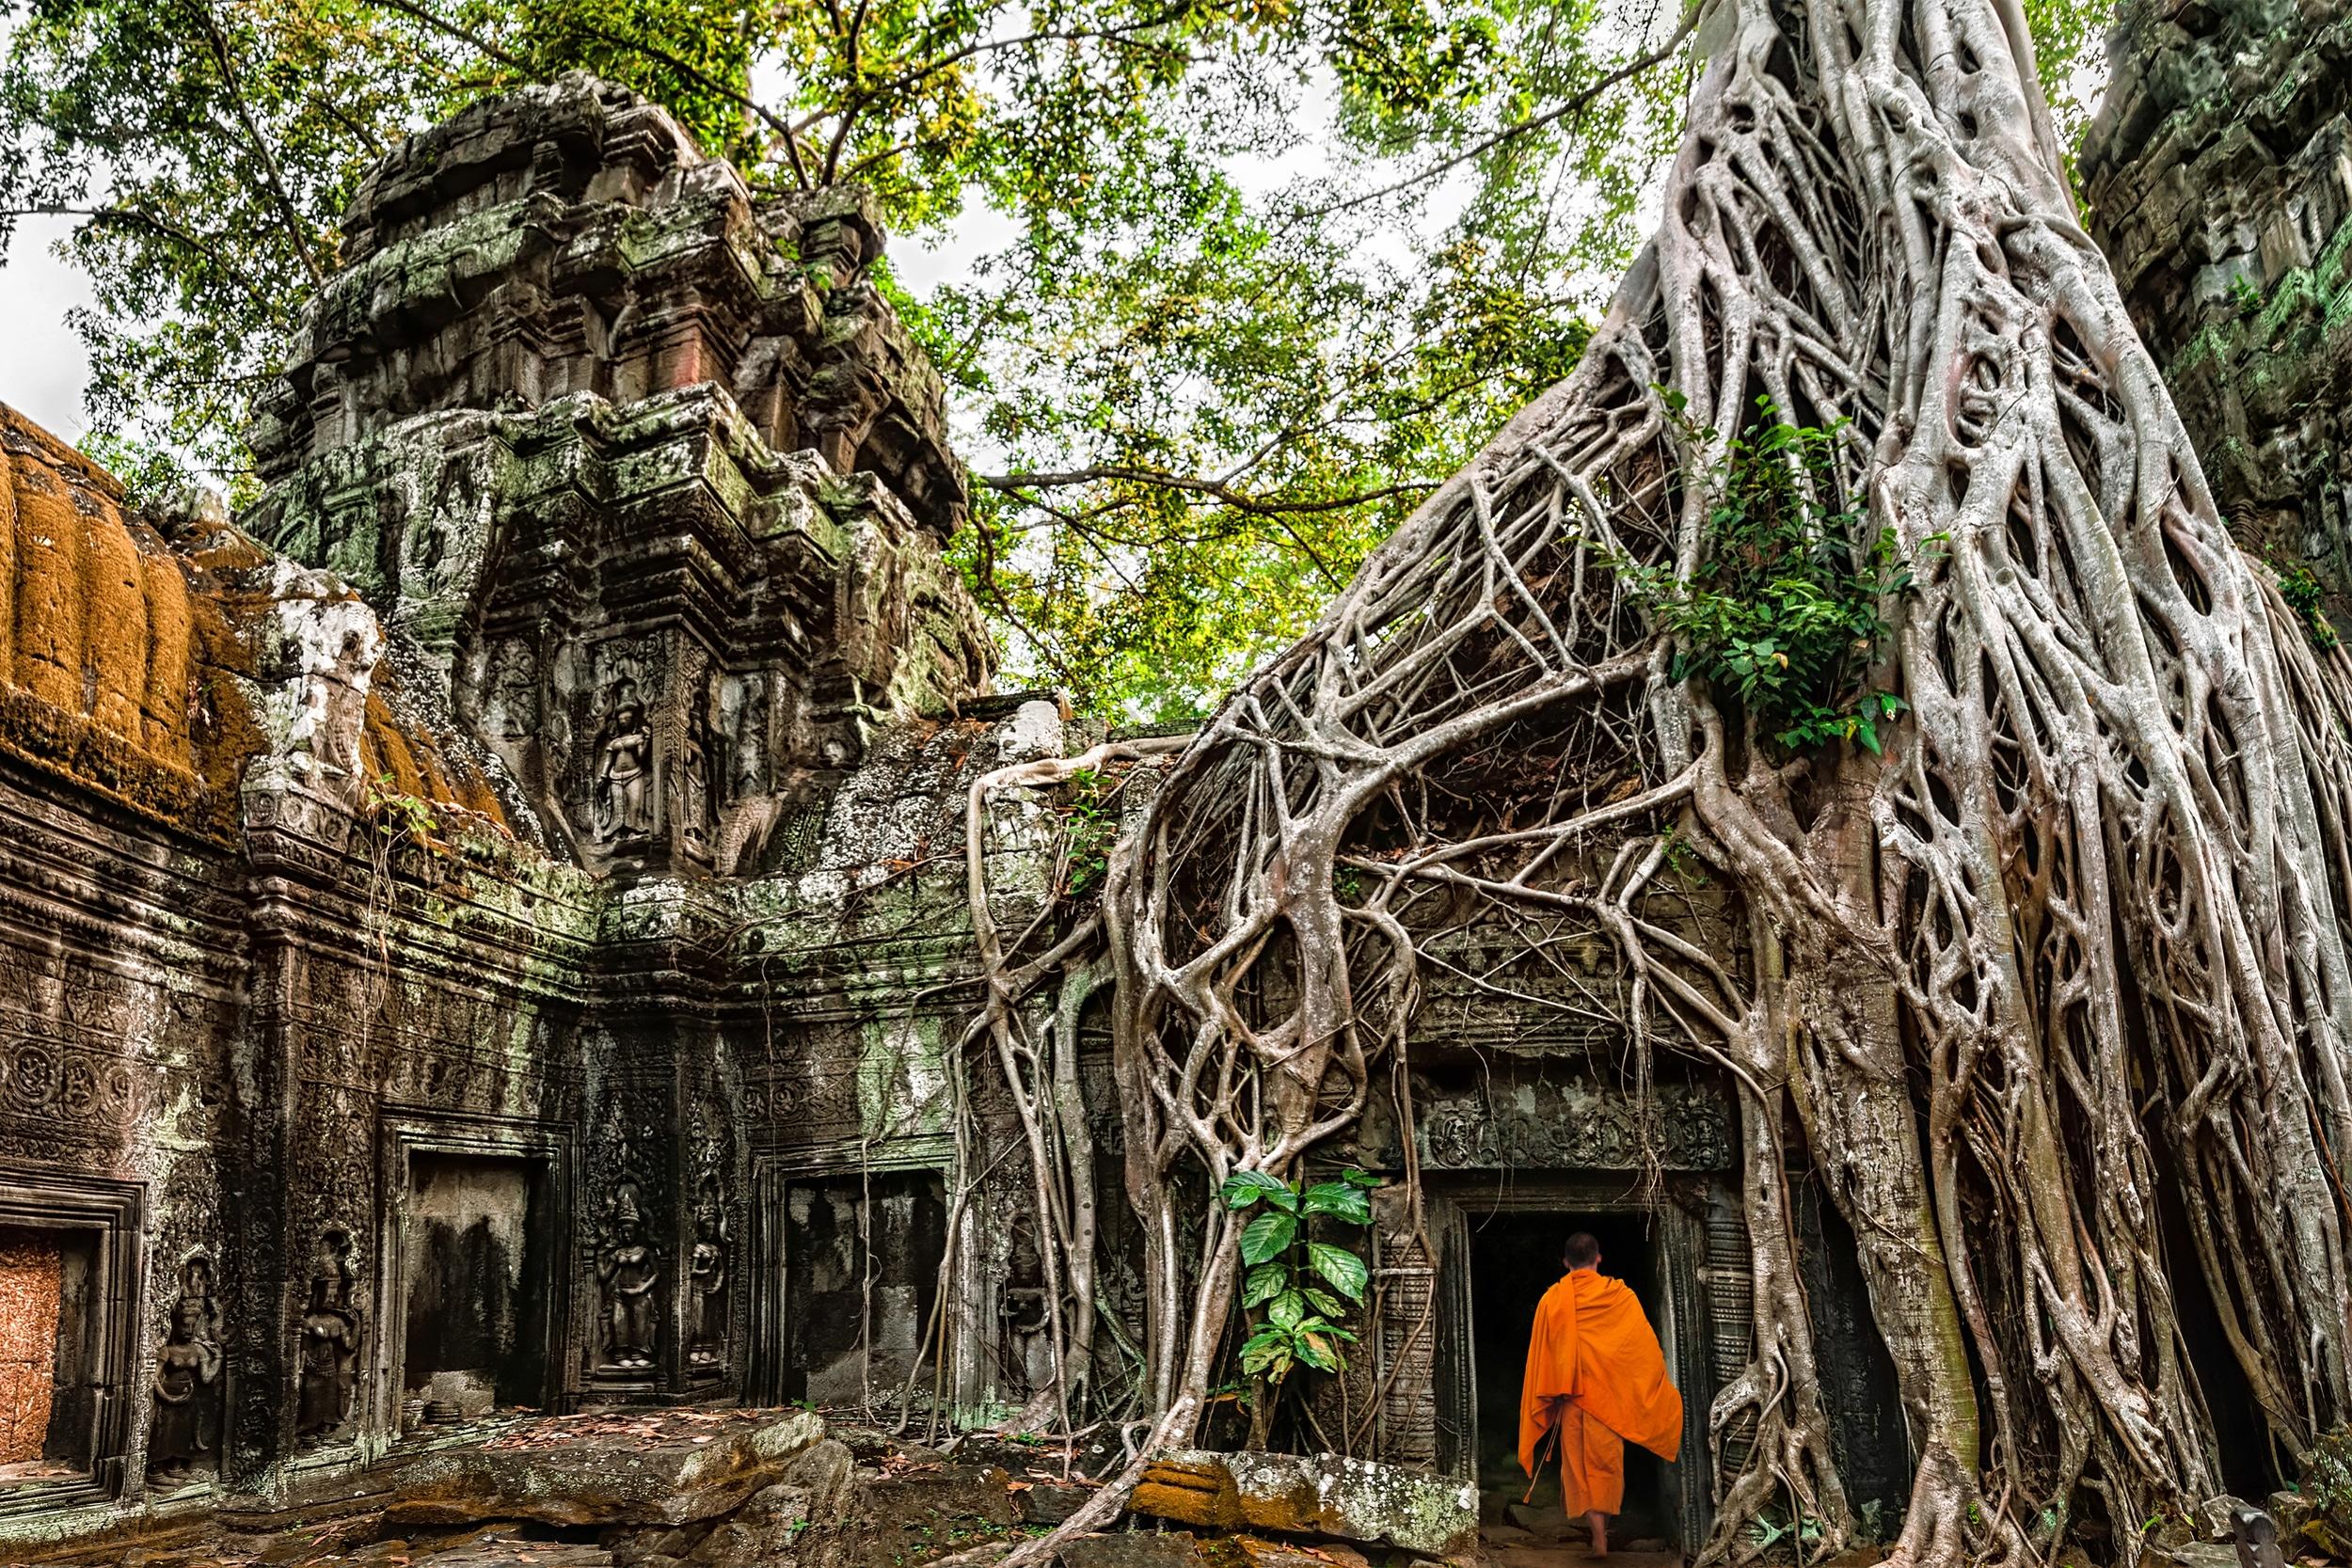 A monk walking through a stone temple